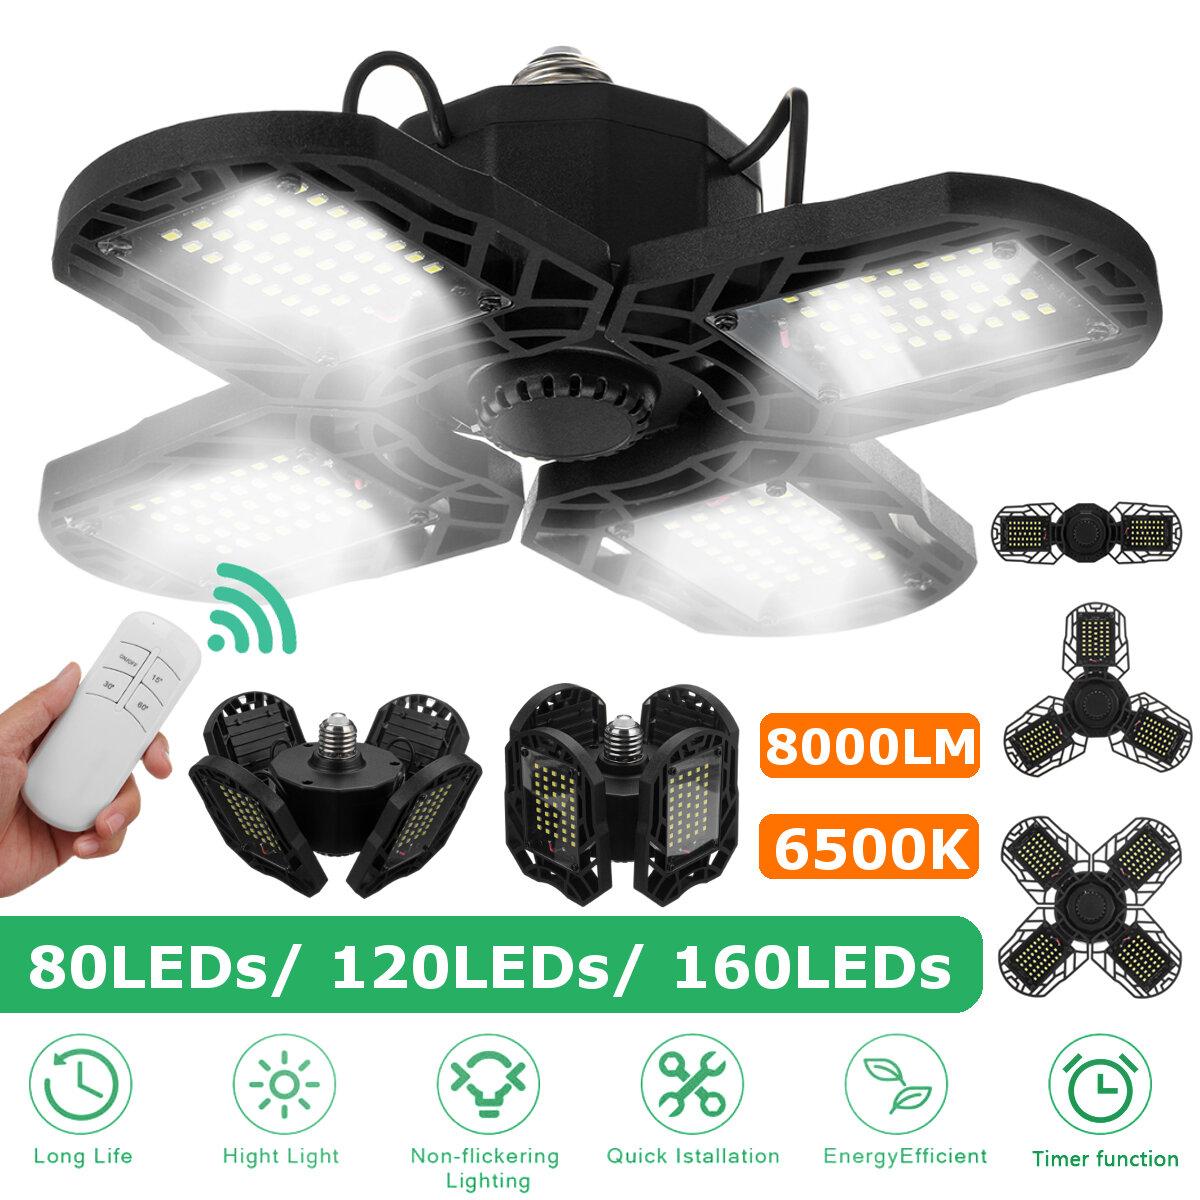 AC85-265V LED Garage Light Bulb E27 E26 Ceiling Fixture Shop Workshop Deformable Lamp Timing Kit